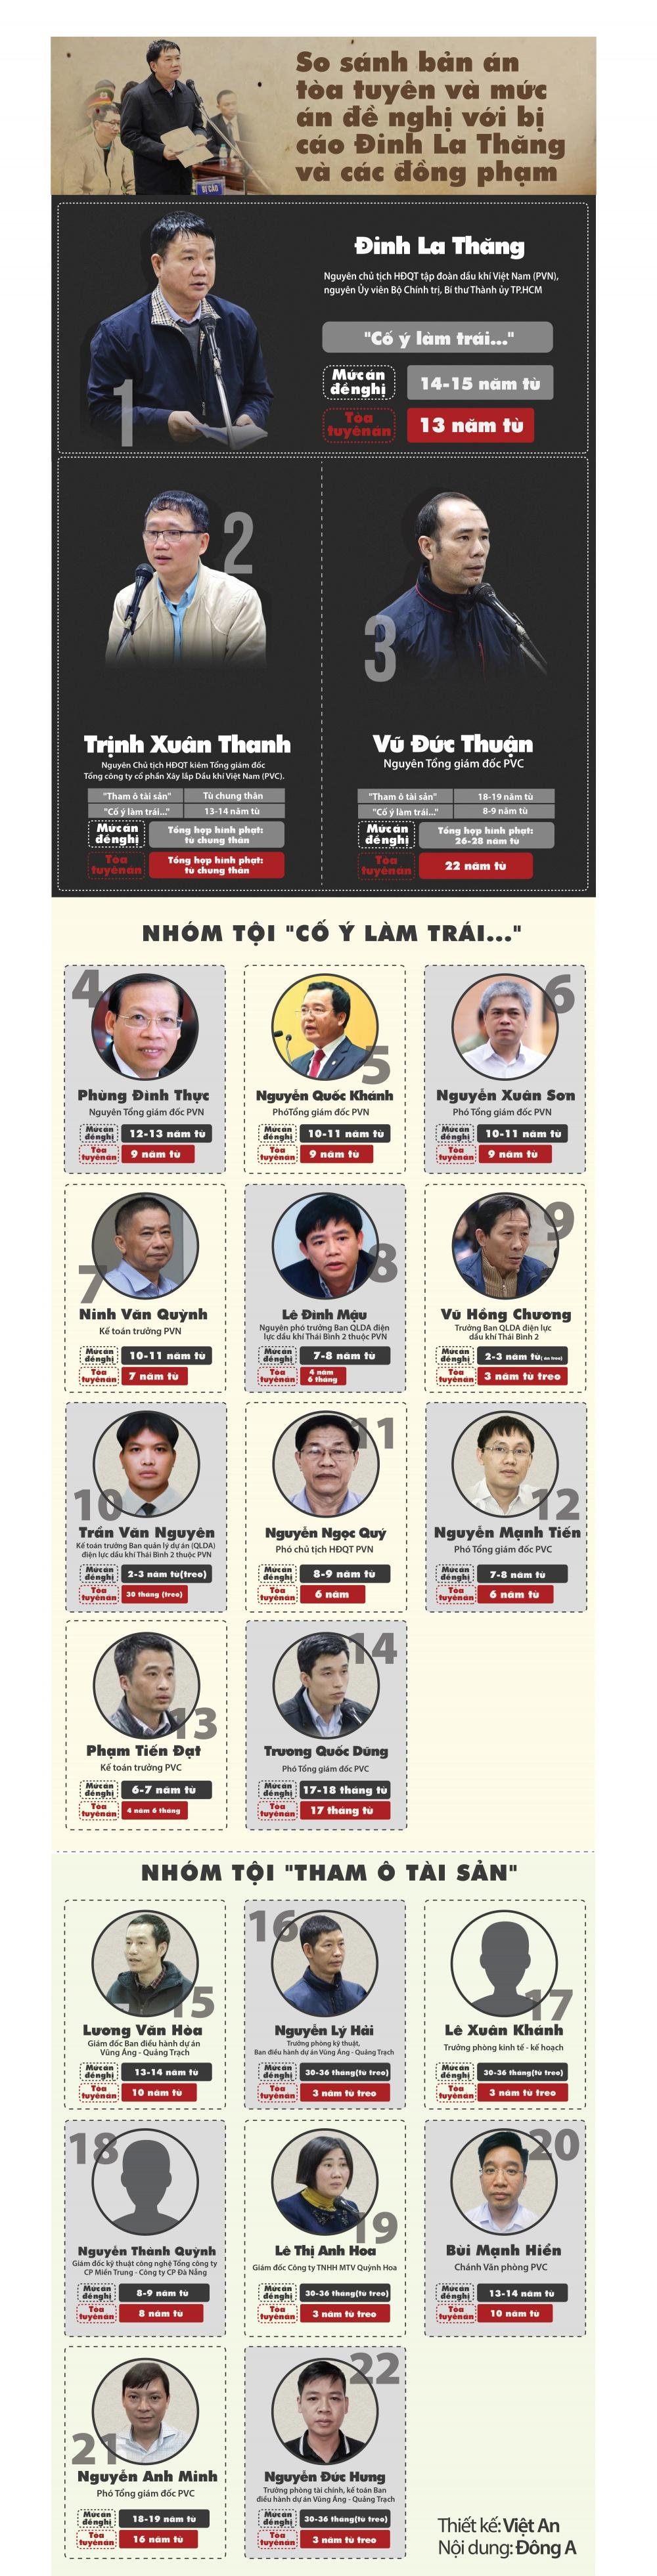 infographics so sanh ban an toa tuyen va muc an de nghi doi voi bi cao dinh la thang va cac dong pham